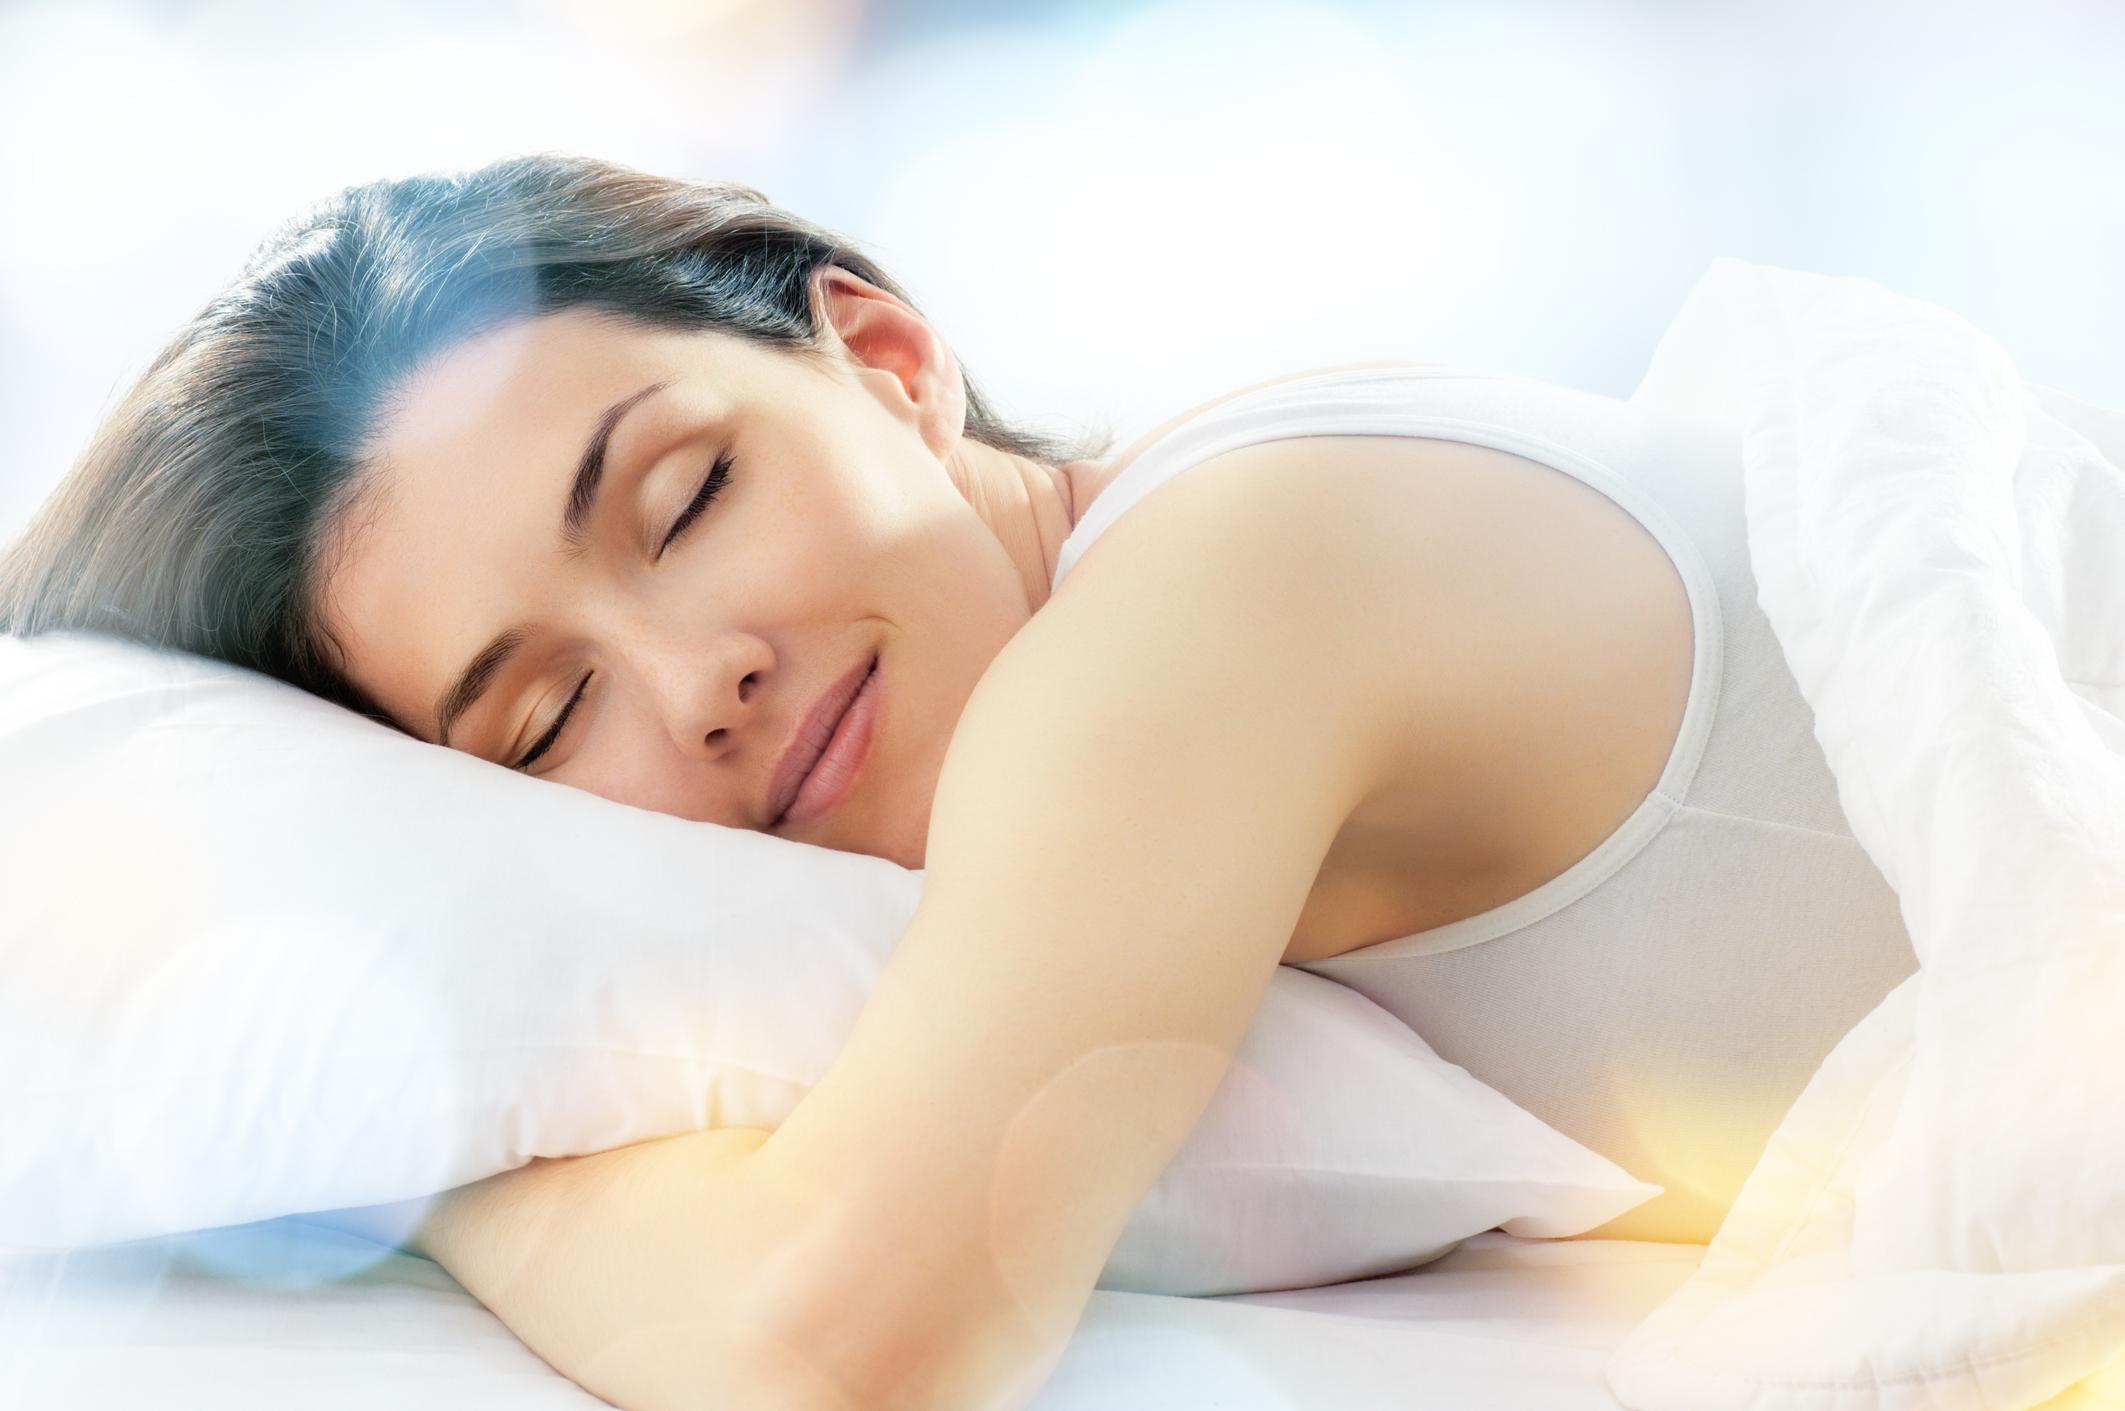 "<a href=""/sleep-apnea-and-snoring-treatment"">Sleep Apnea Treatment</a>"